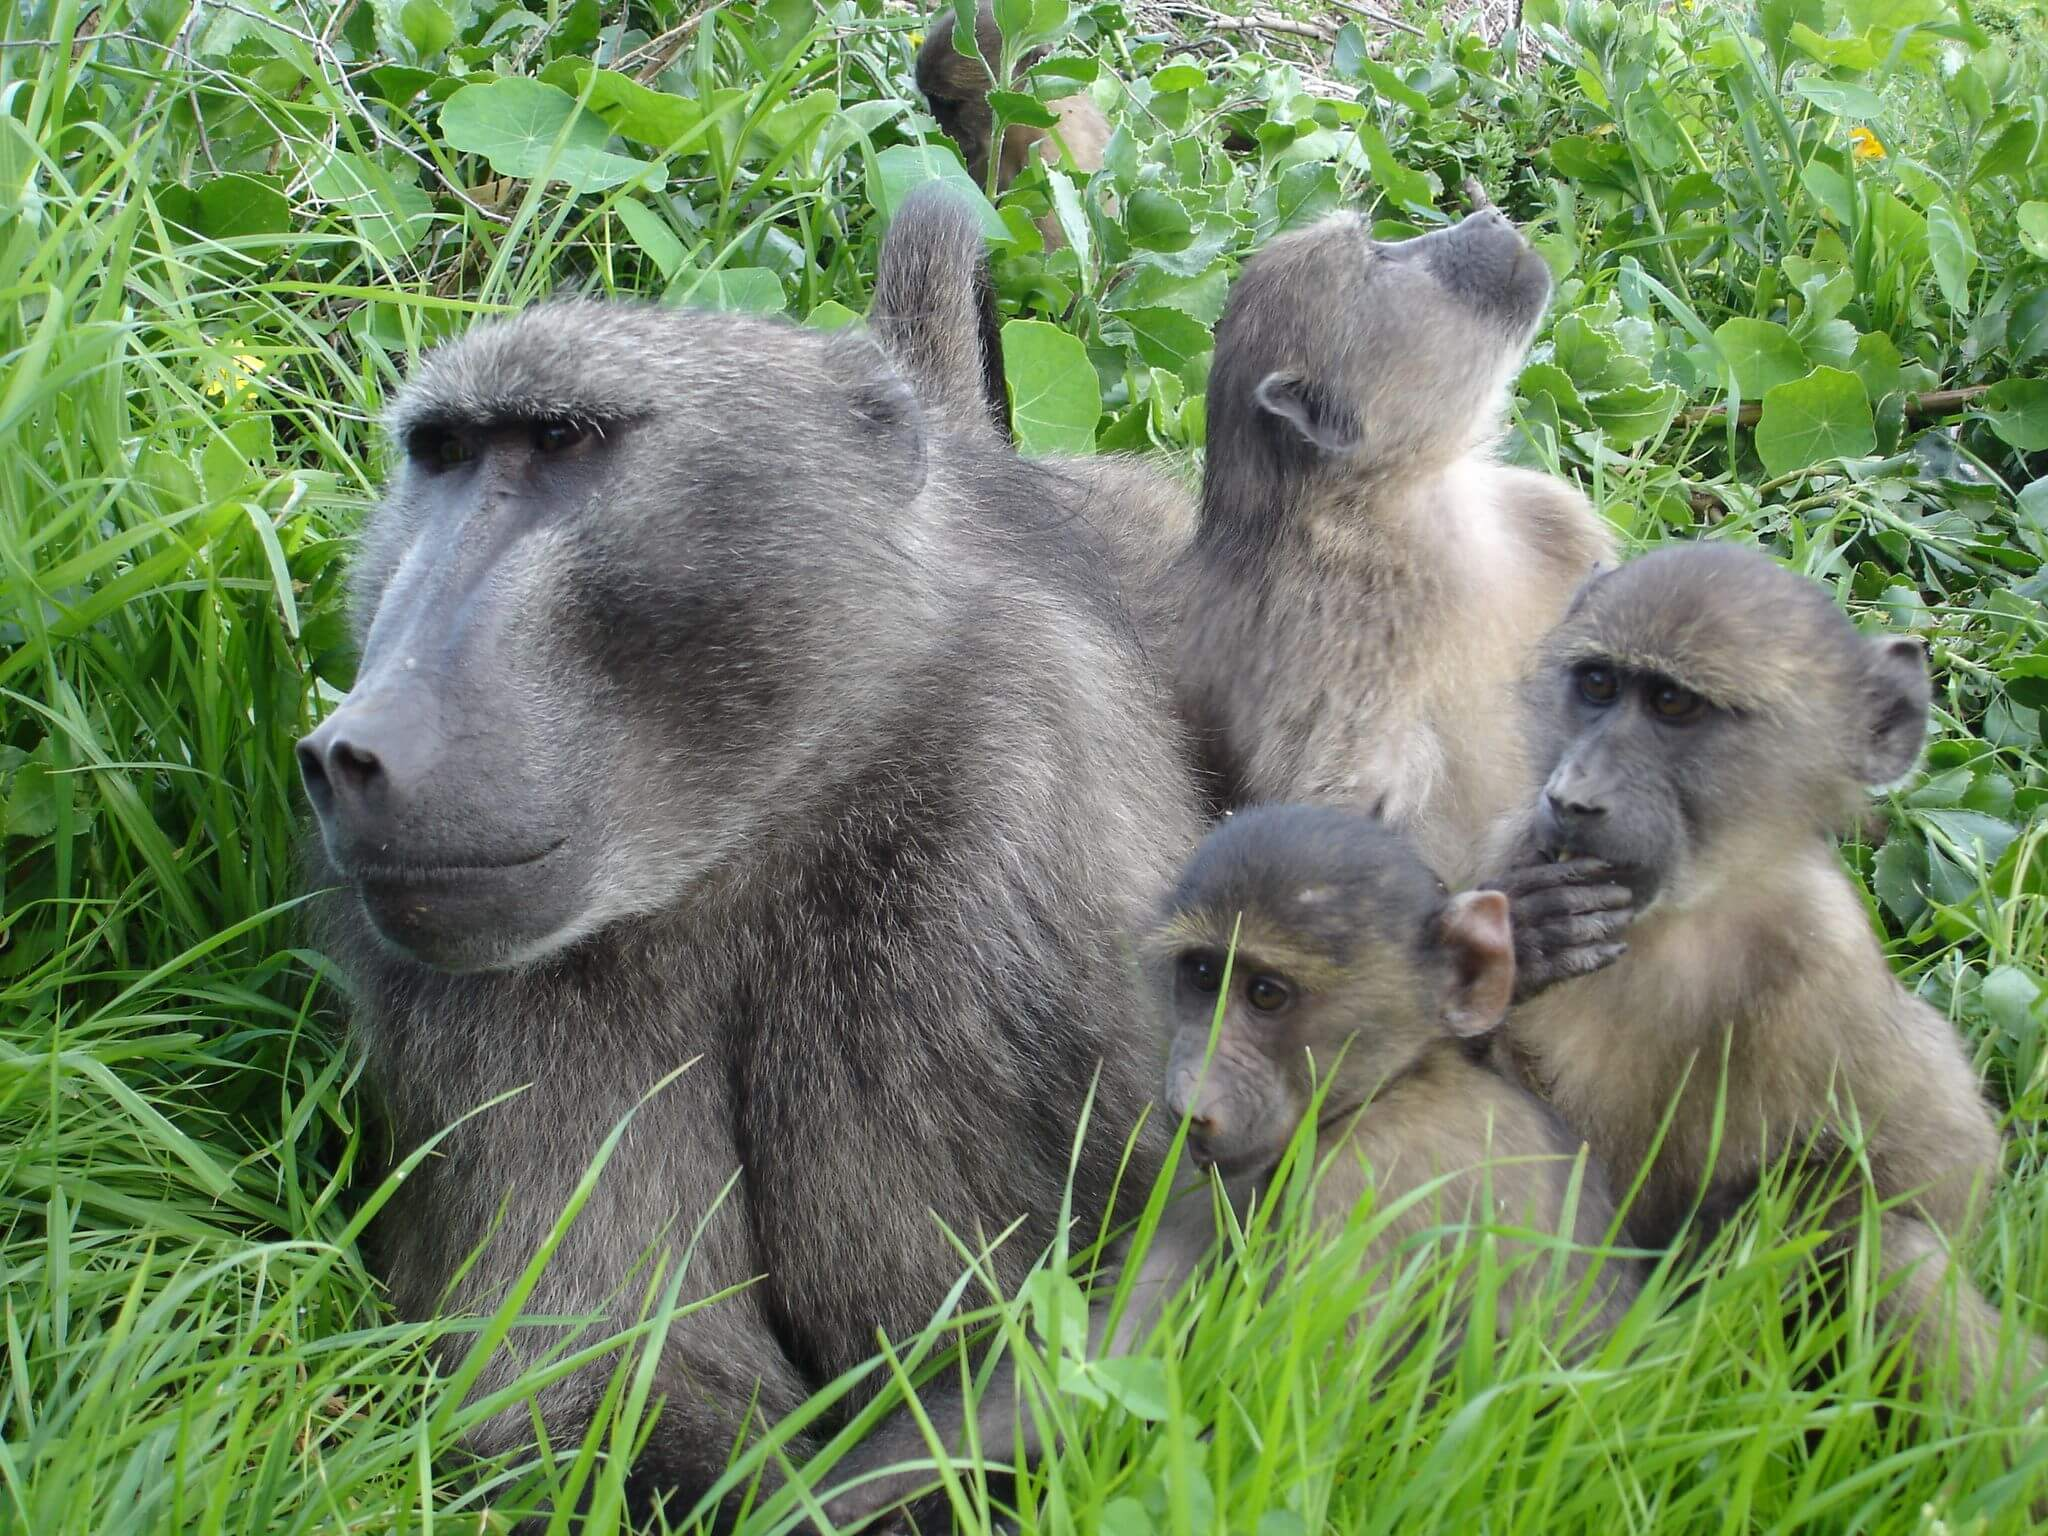 medvezhiy babuin podayot signal Медвежий бабуин